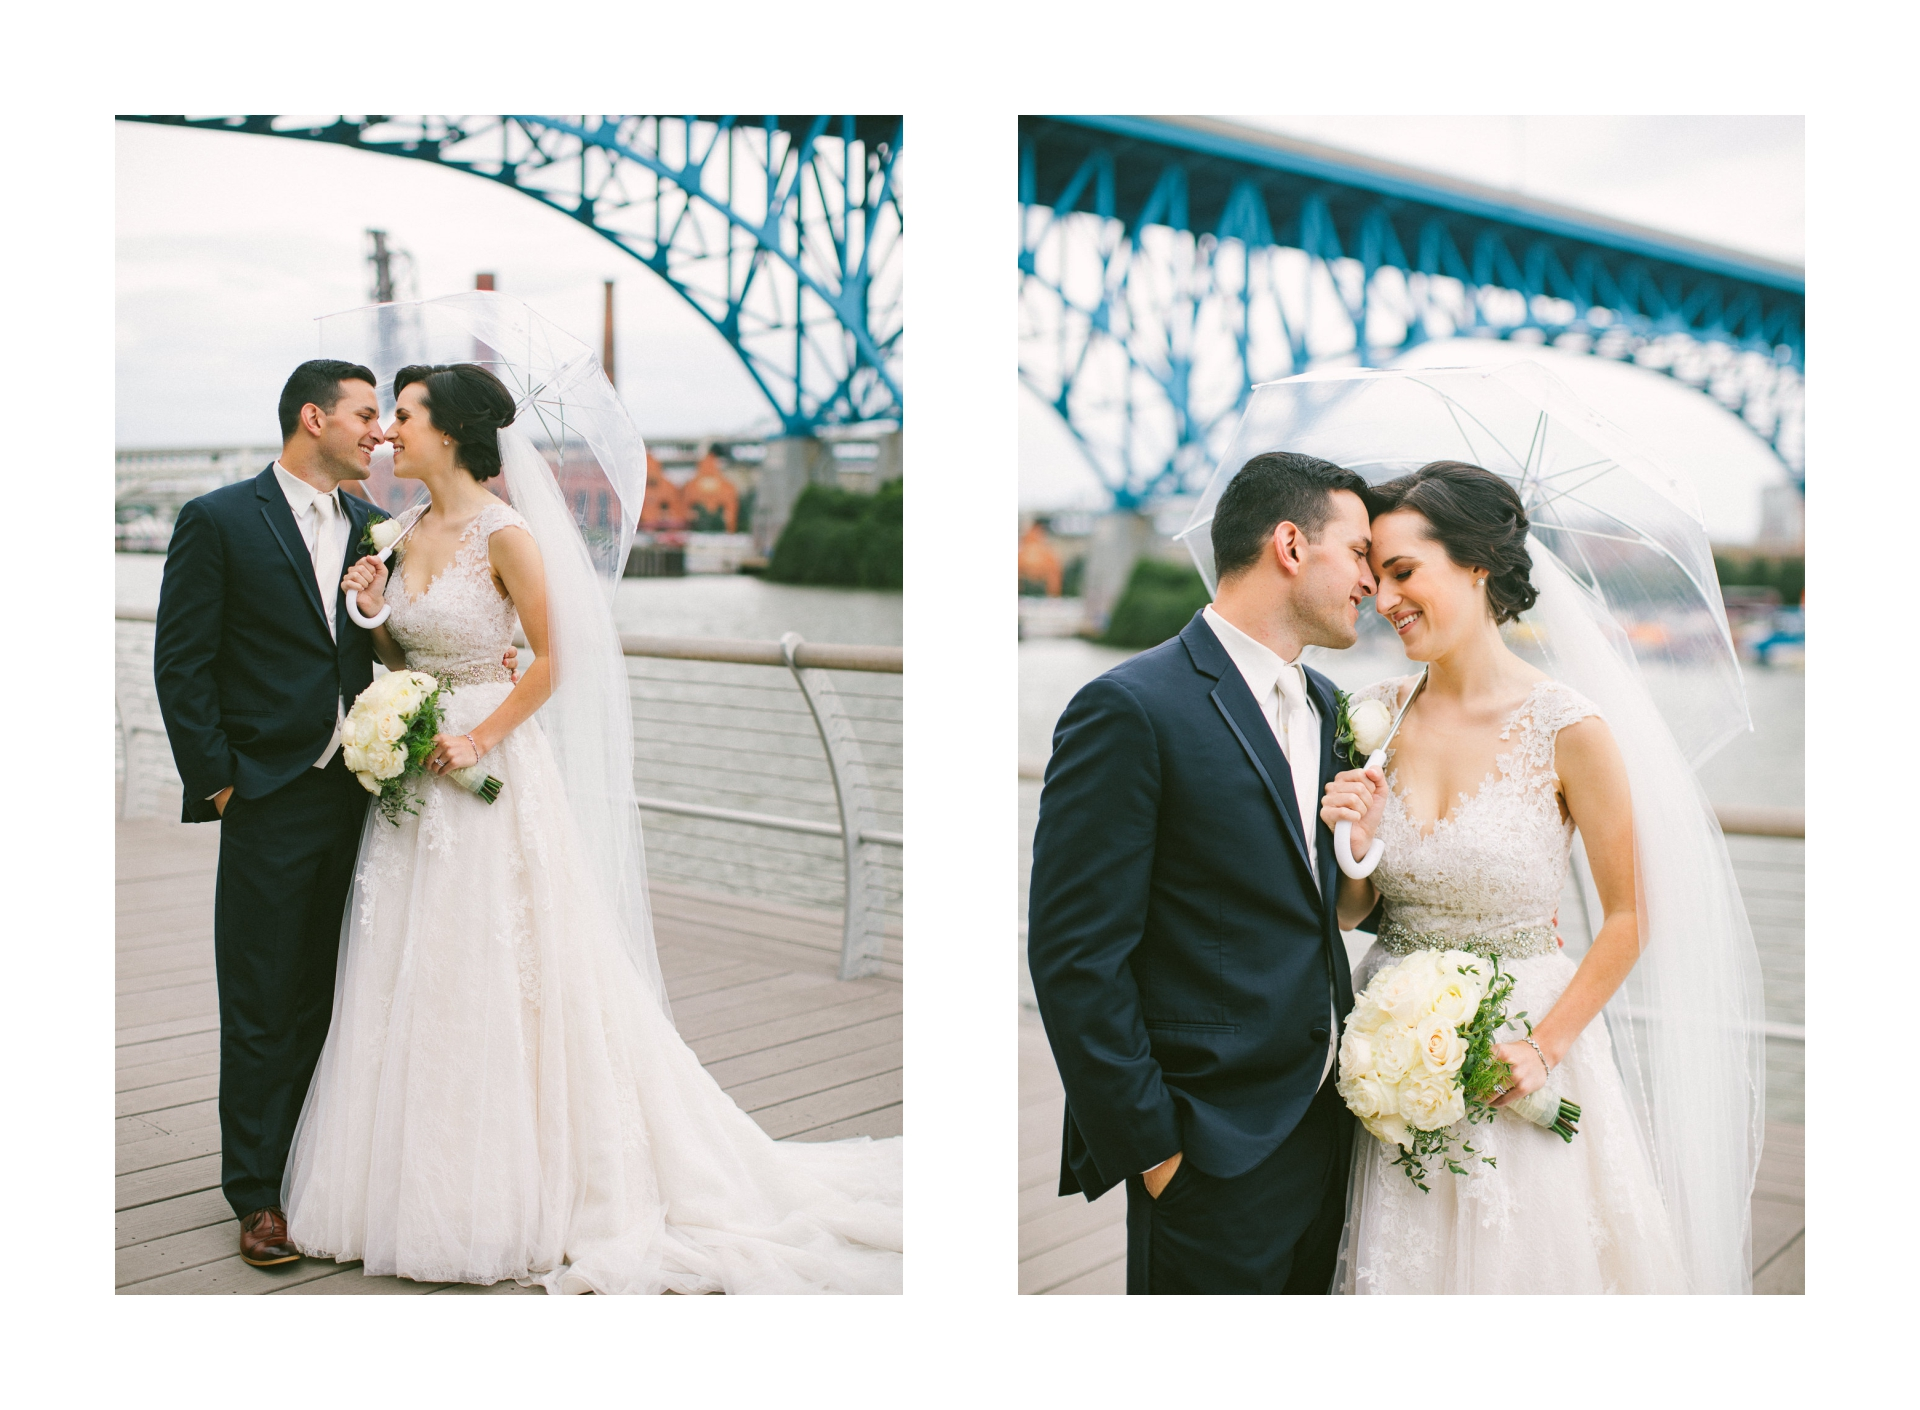 Intercontinental Hotel Wedding in Cleveland 2 20.jpg